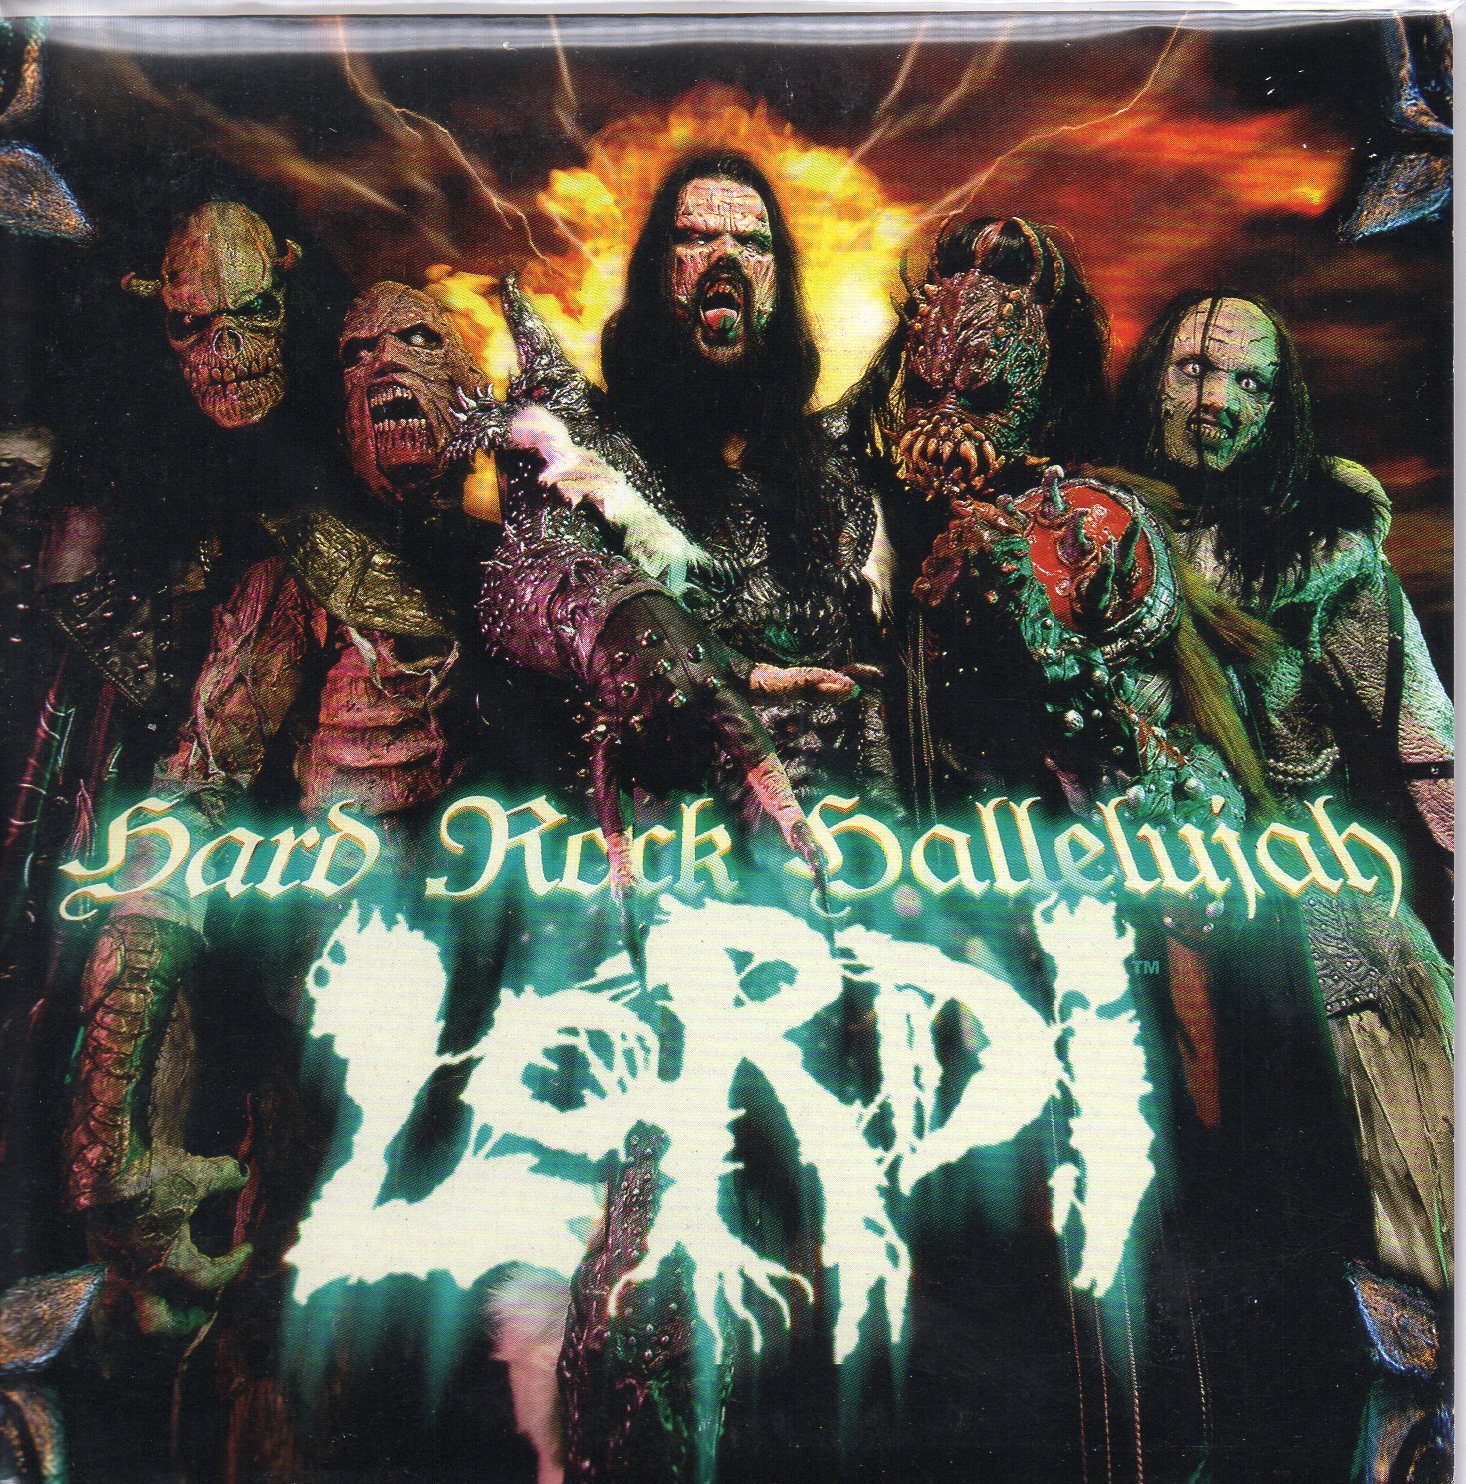 EUROVISION 2006 FINLANDE : LORDI - Hard rock hallelujah 2-track CARD SLEEVE - CD single